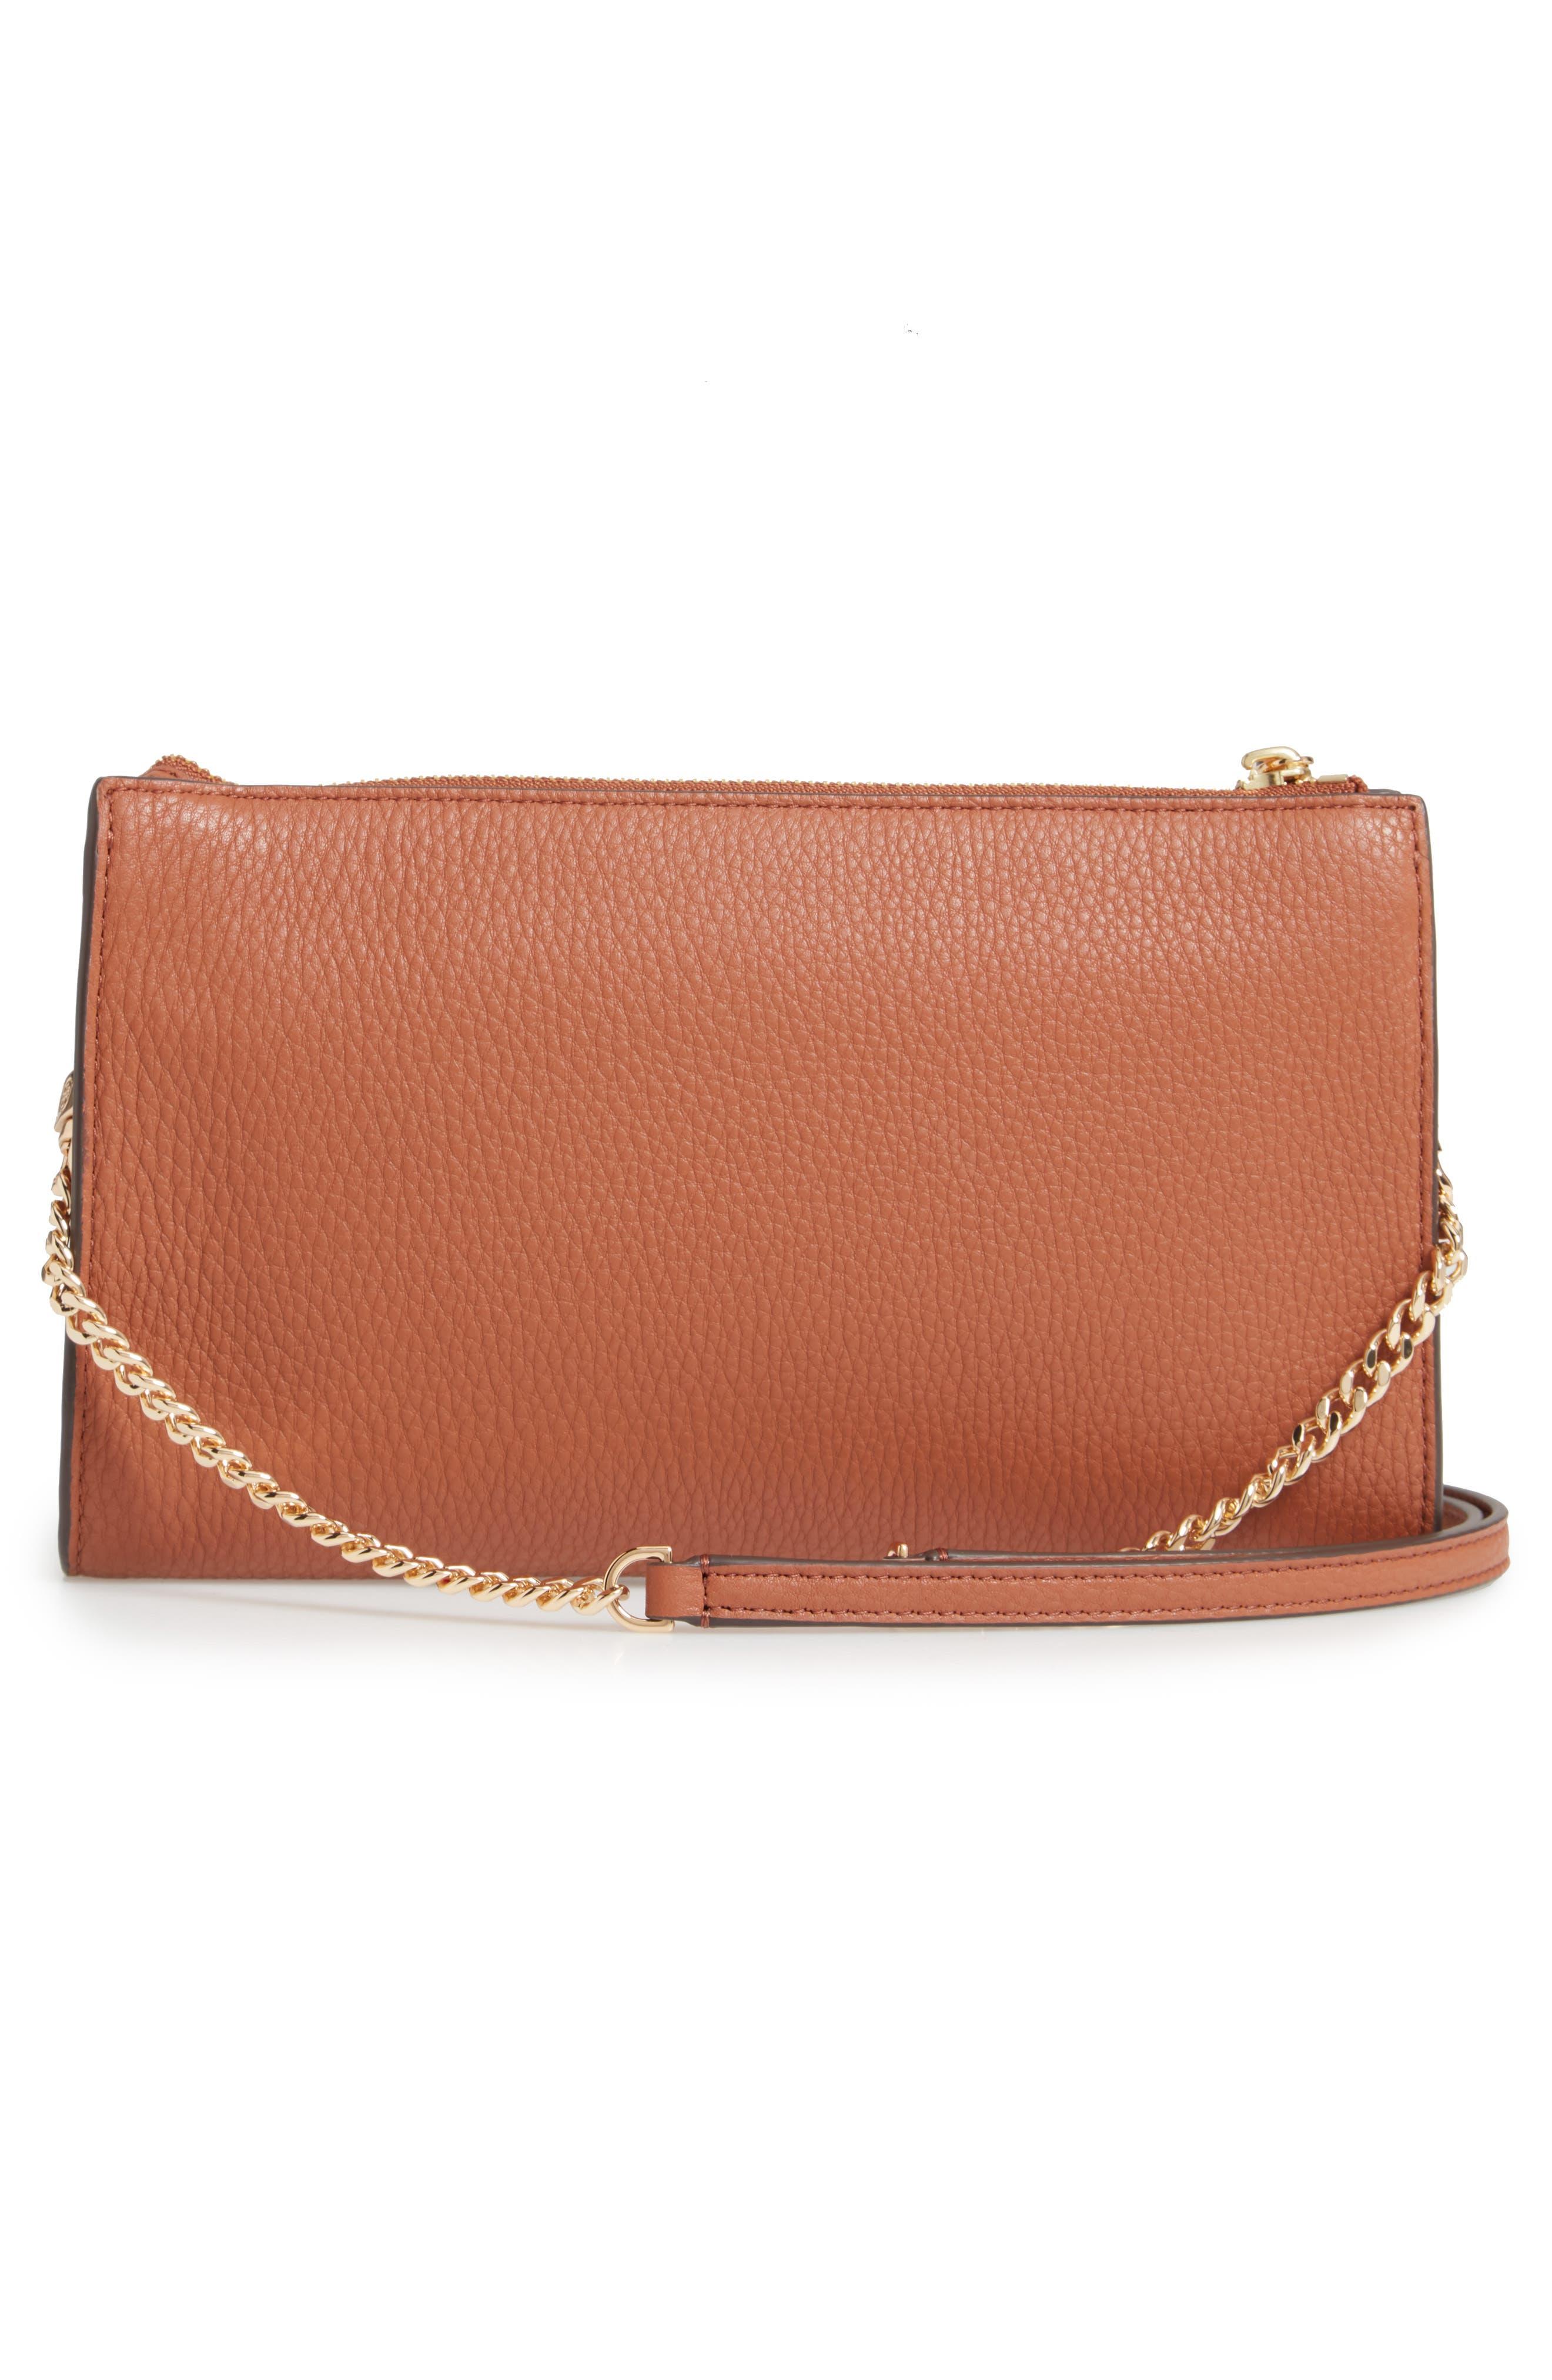 TORY BURCH,                             Pebbled Leather Top Zip Crossbody Bag,                             Alternate thumbnail 3, color,                             CLASSIC TAN